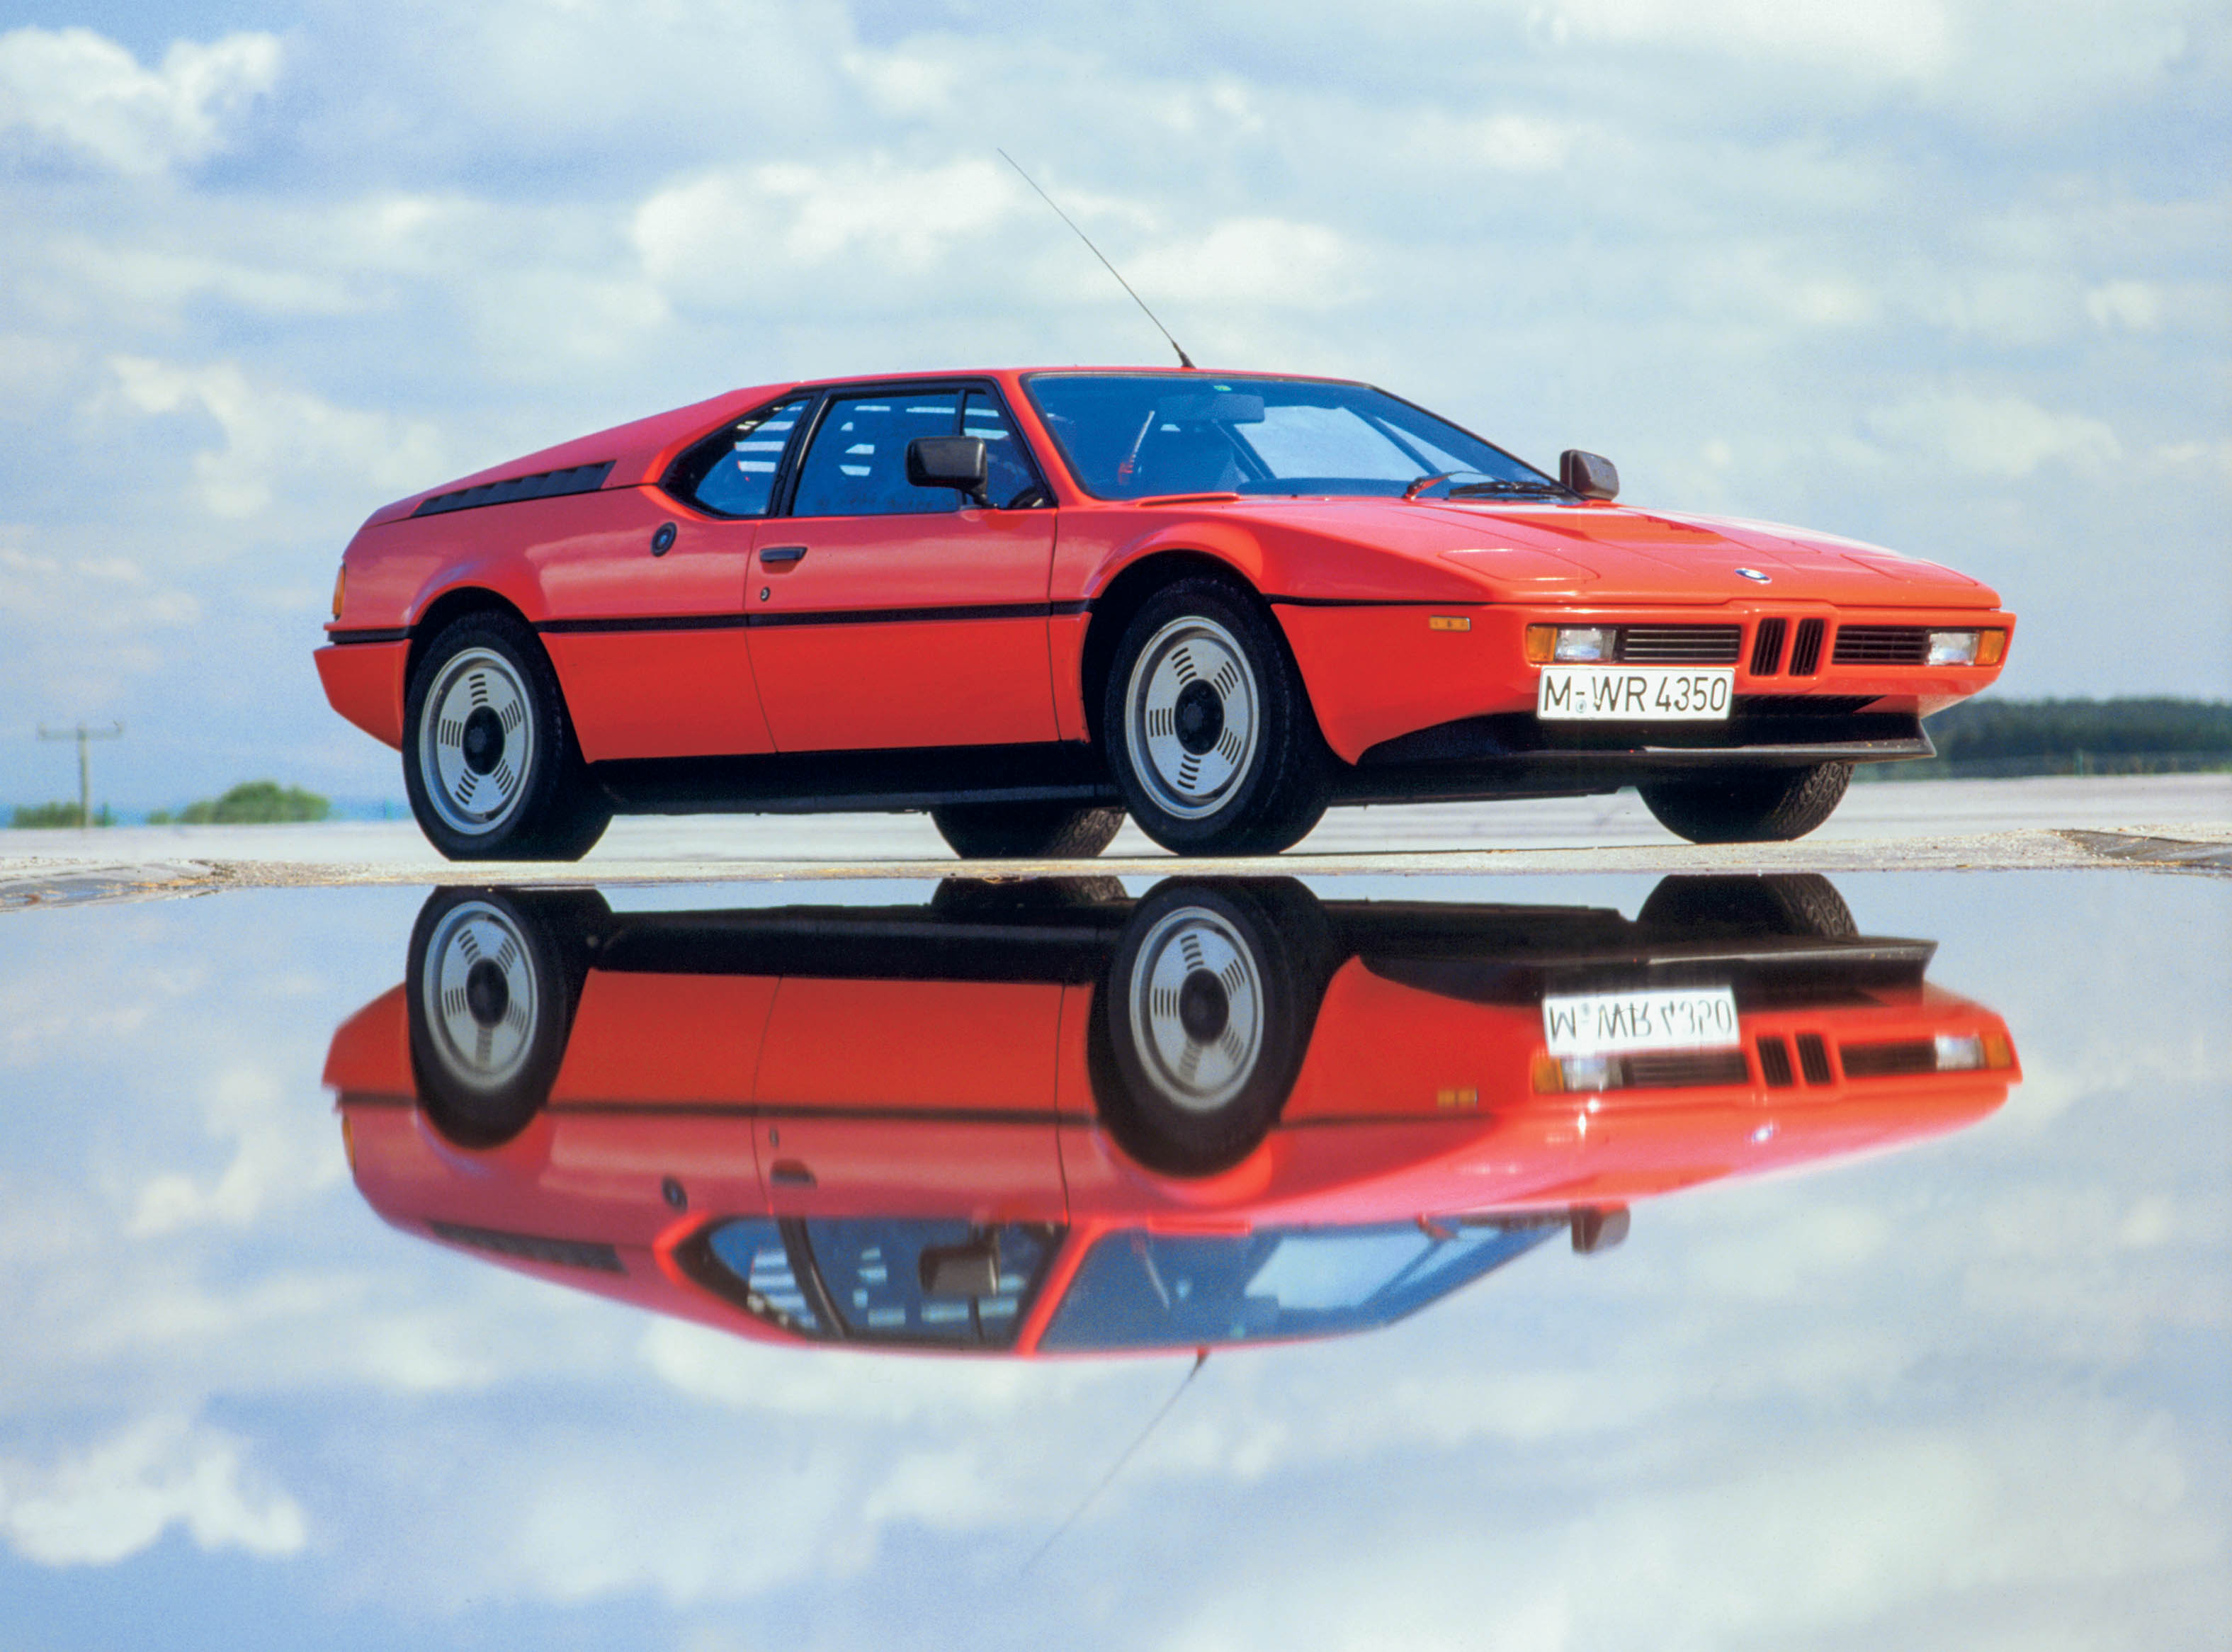 BMW M1 low 3/4 passenger reflection